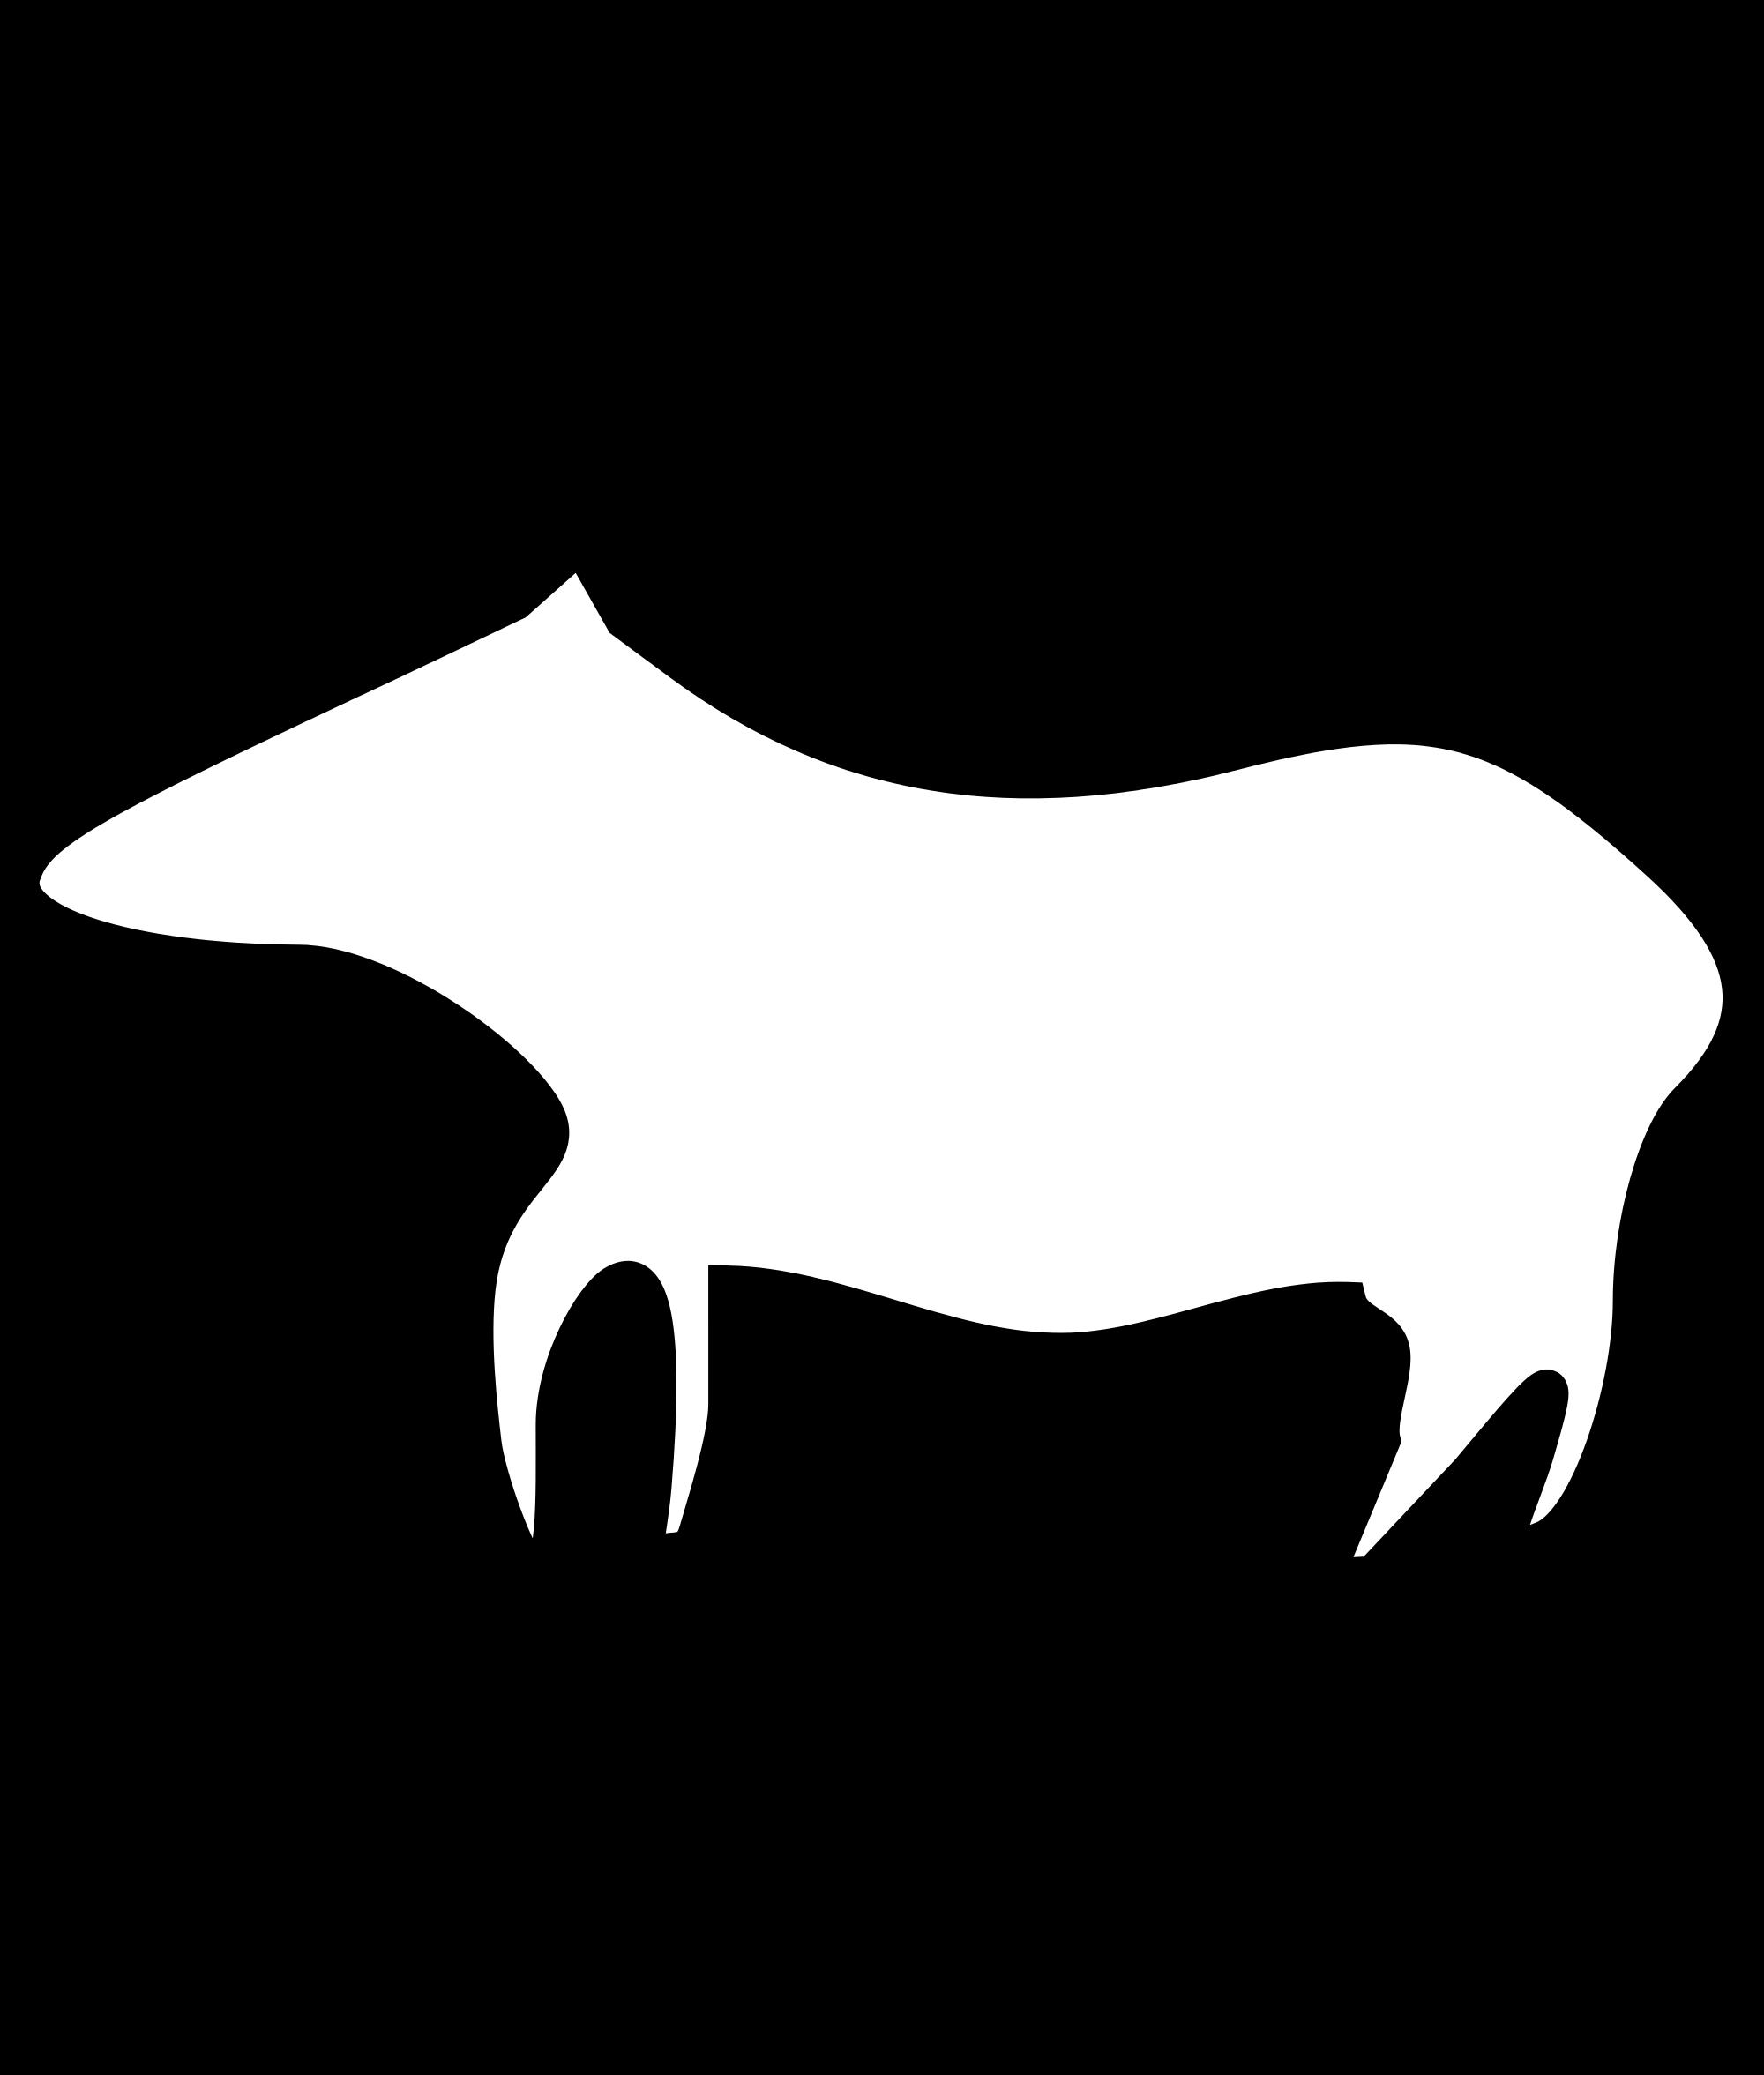 Tapir svg #12, Download drawings